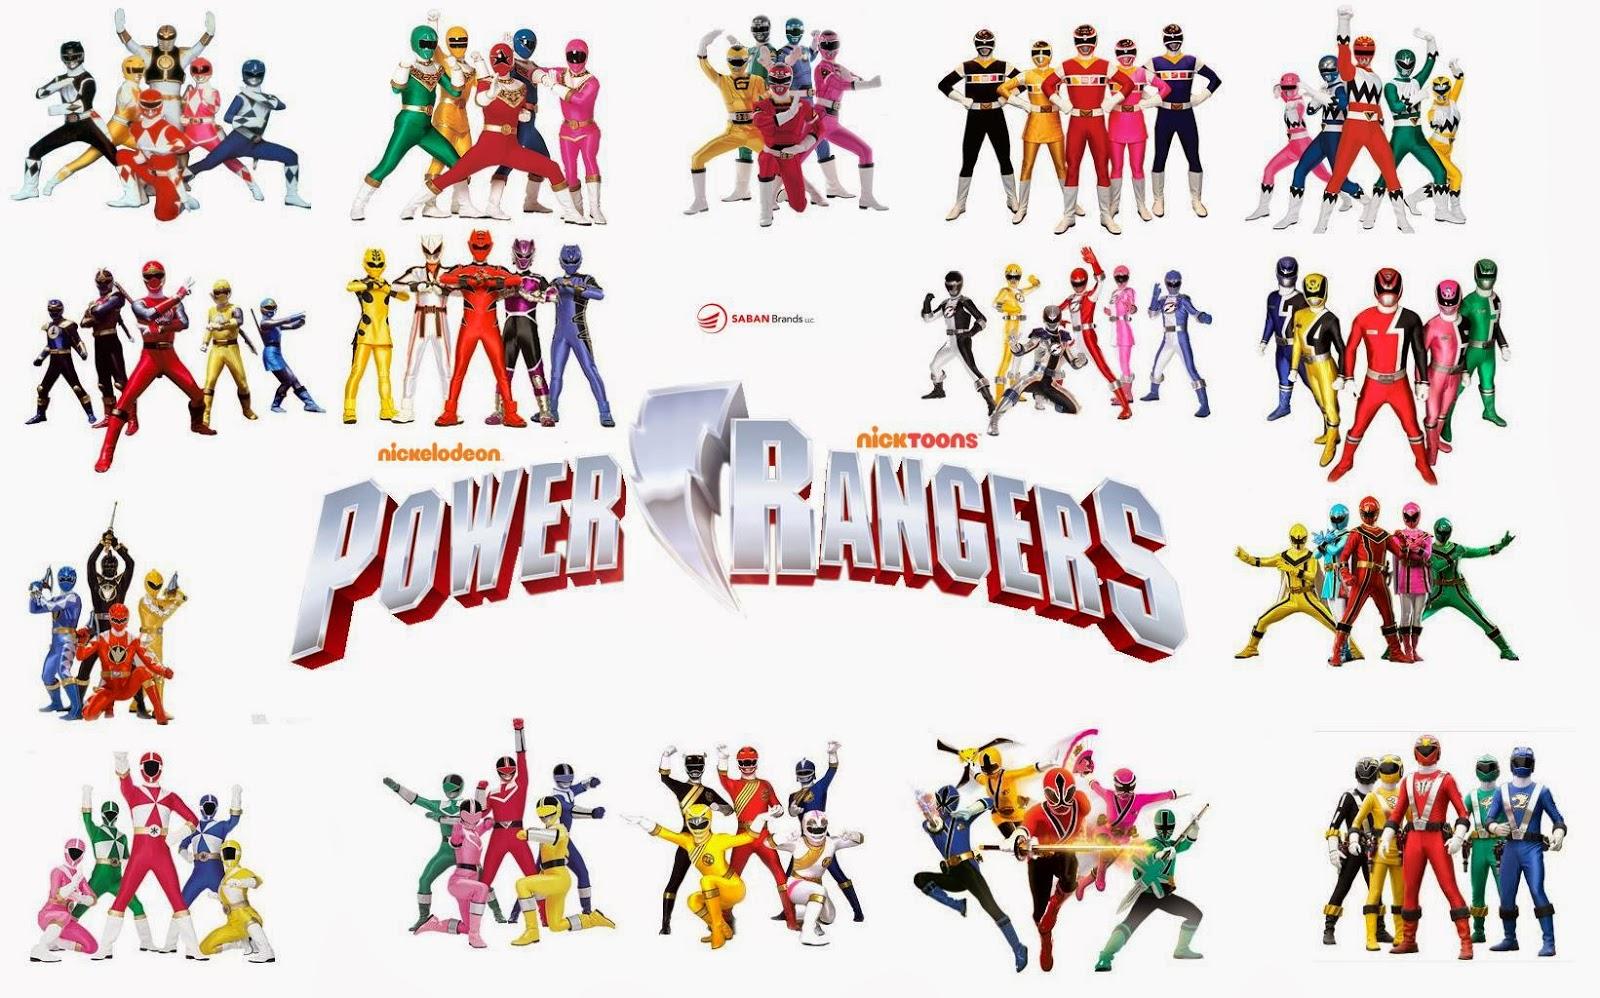 El Blog De Migeru La Gran Historia De Power Rangers Parte 2